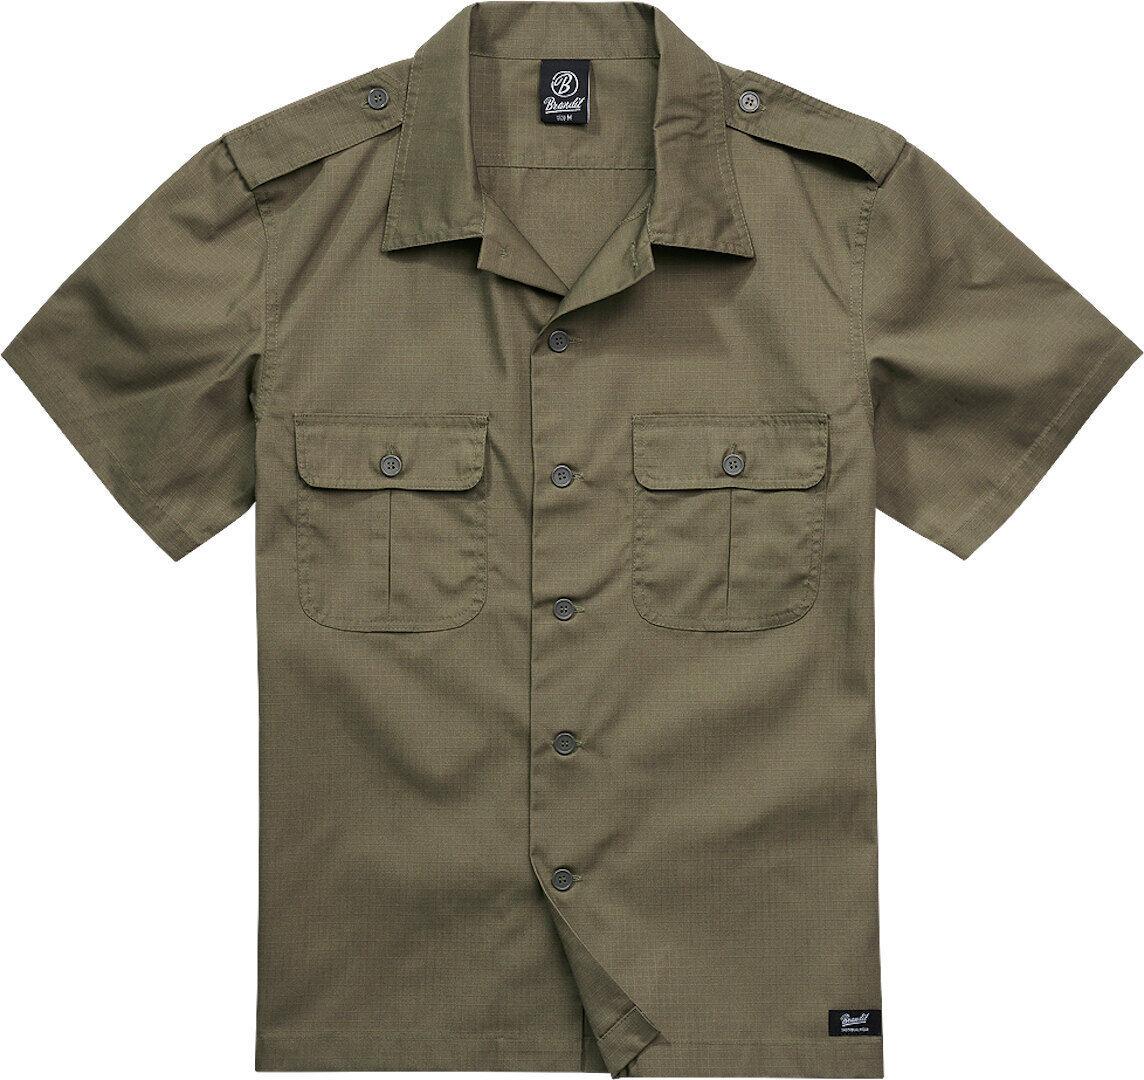 Brandit US Ripstop Paita  - Vihreä - Size: 5XL